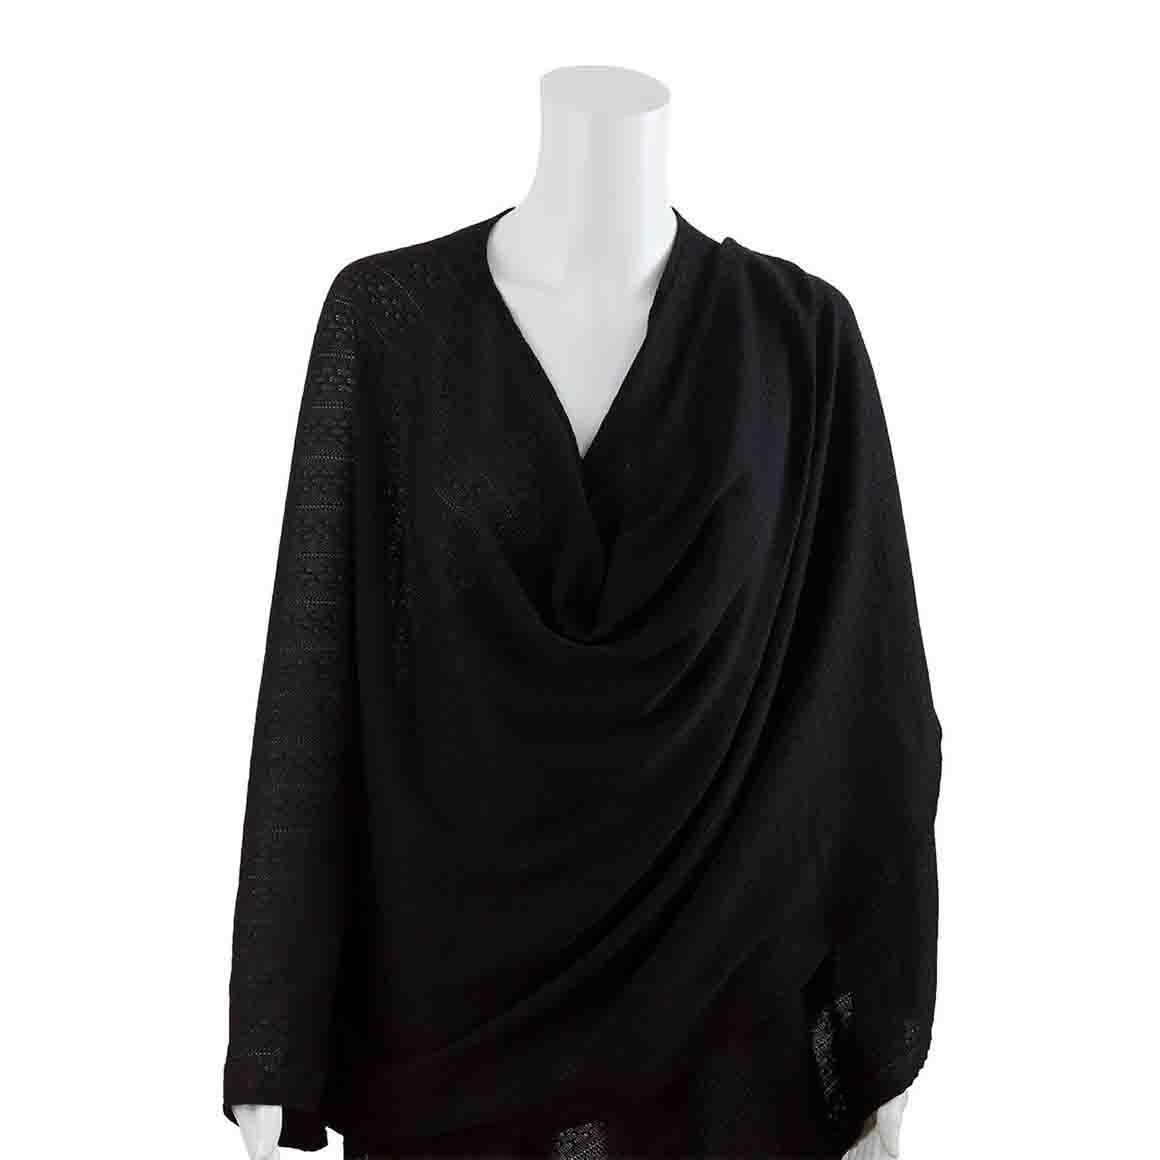 Textured Knit Nursing Cover | Trada Marketplace